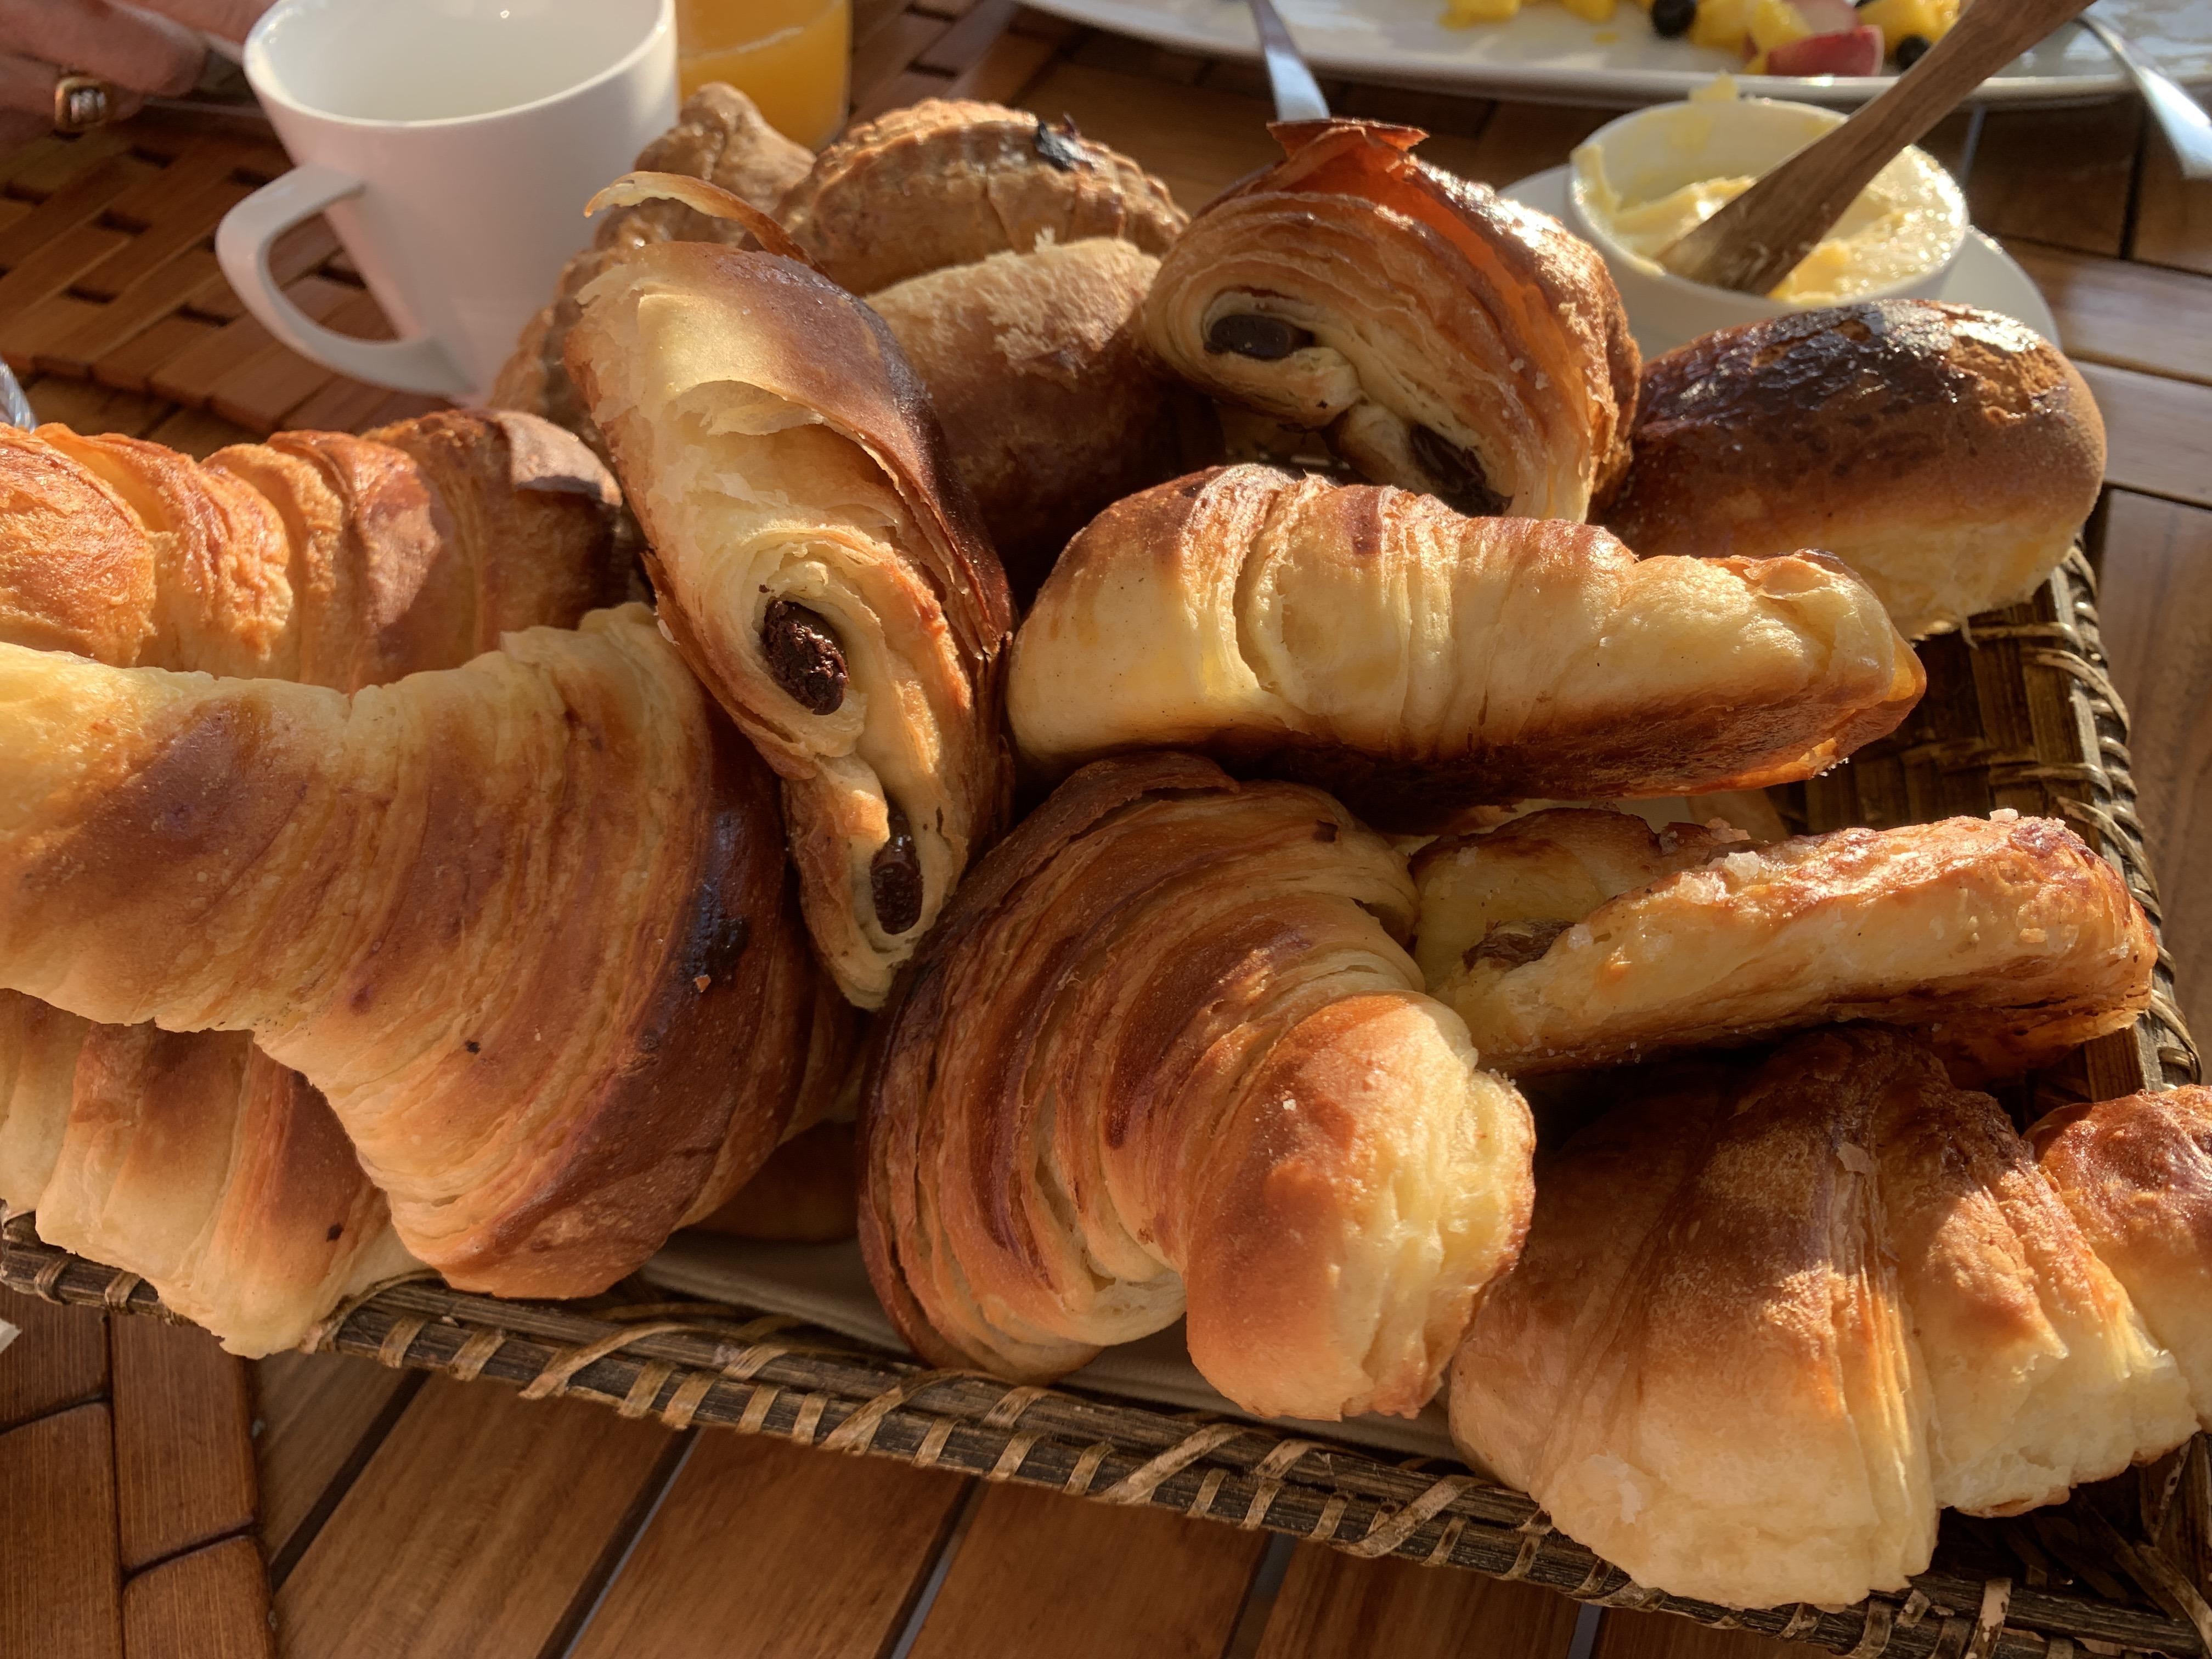 Bread Around the World Croissants and Pain au chocolat European Waterways